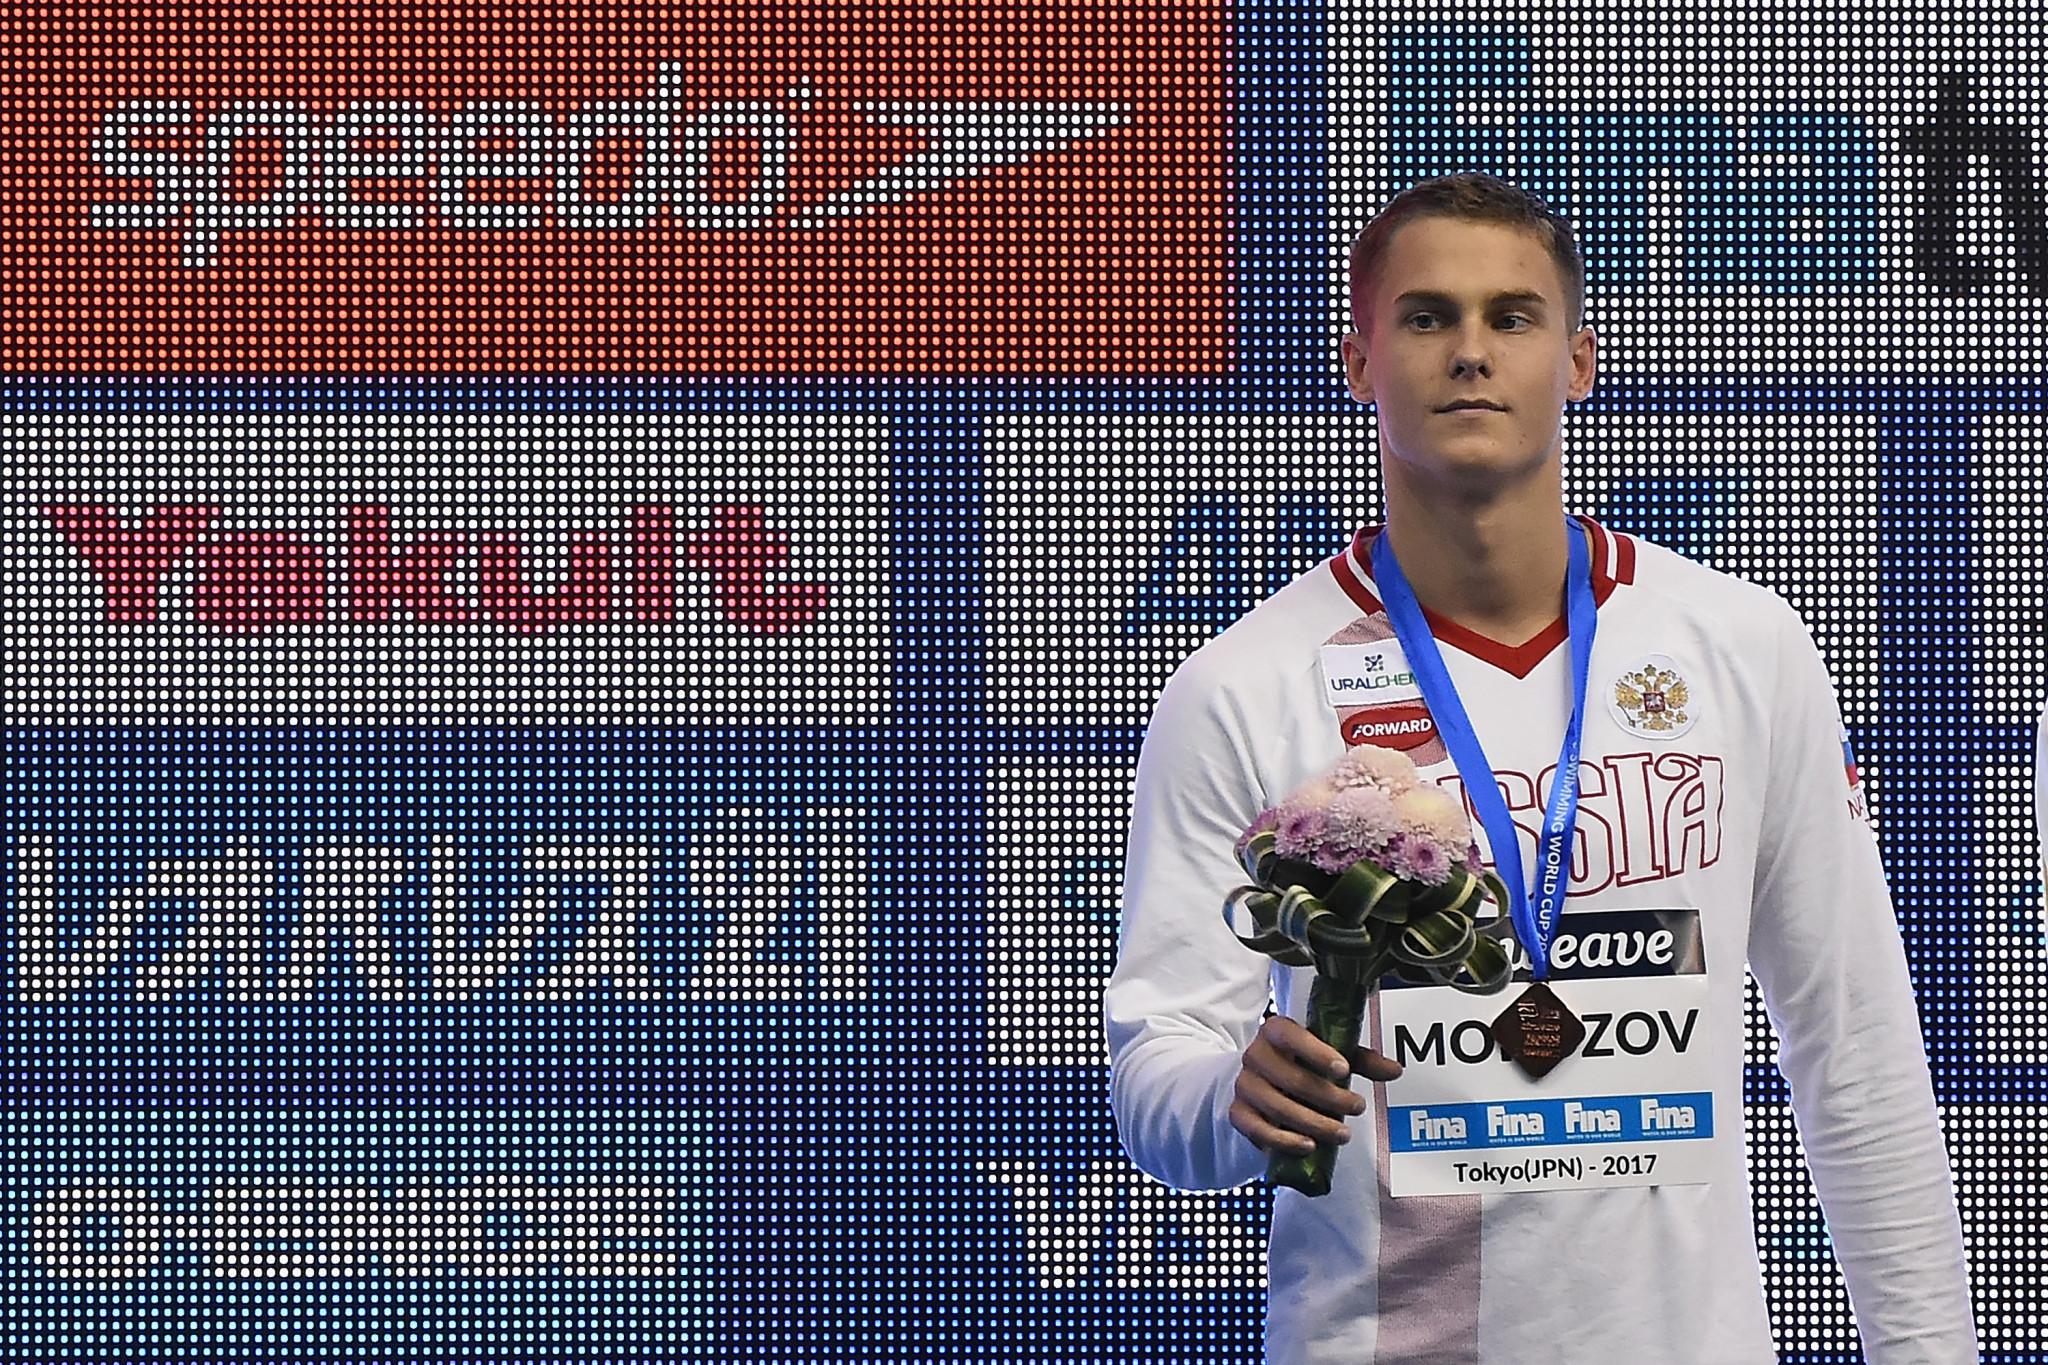 Morozov victories at Singapore FINA World Cup keep champion-elect Le Clos waiting